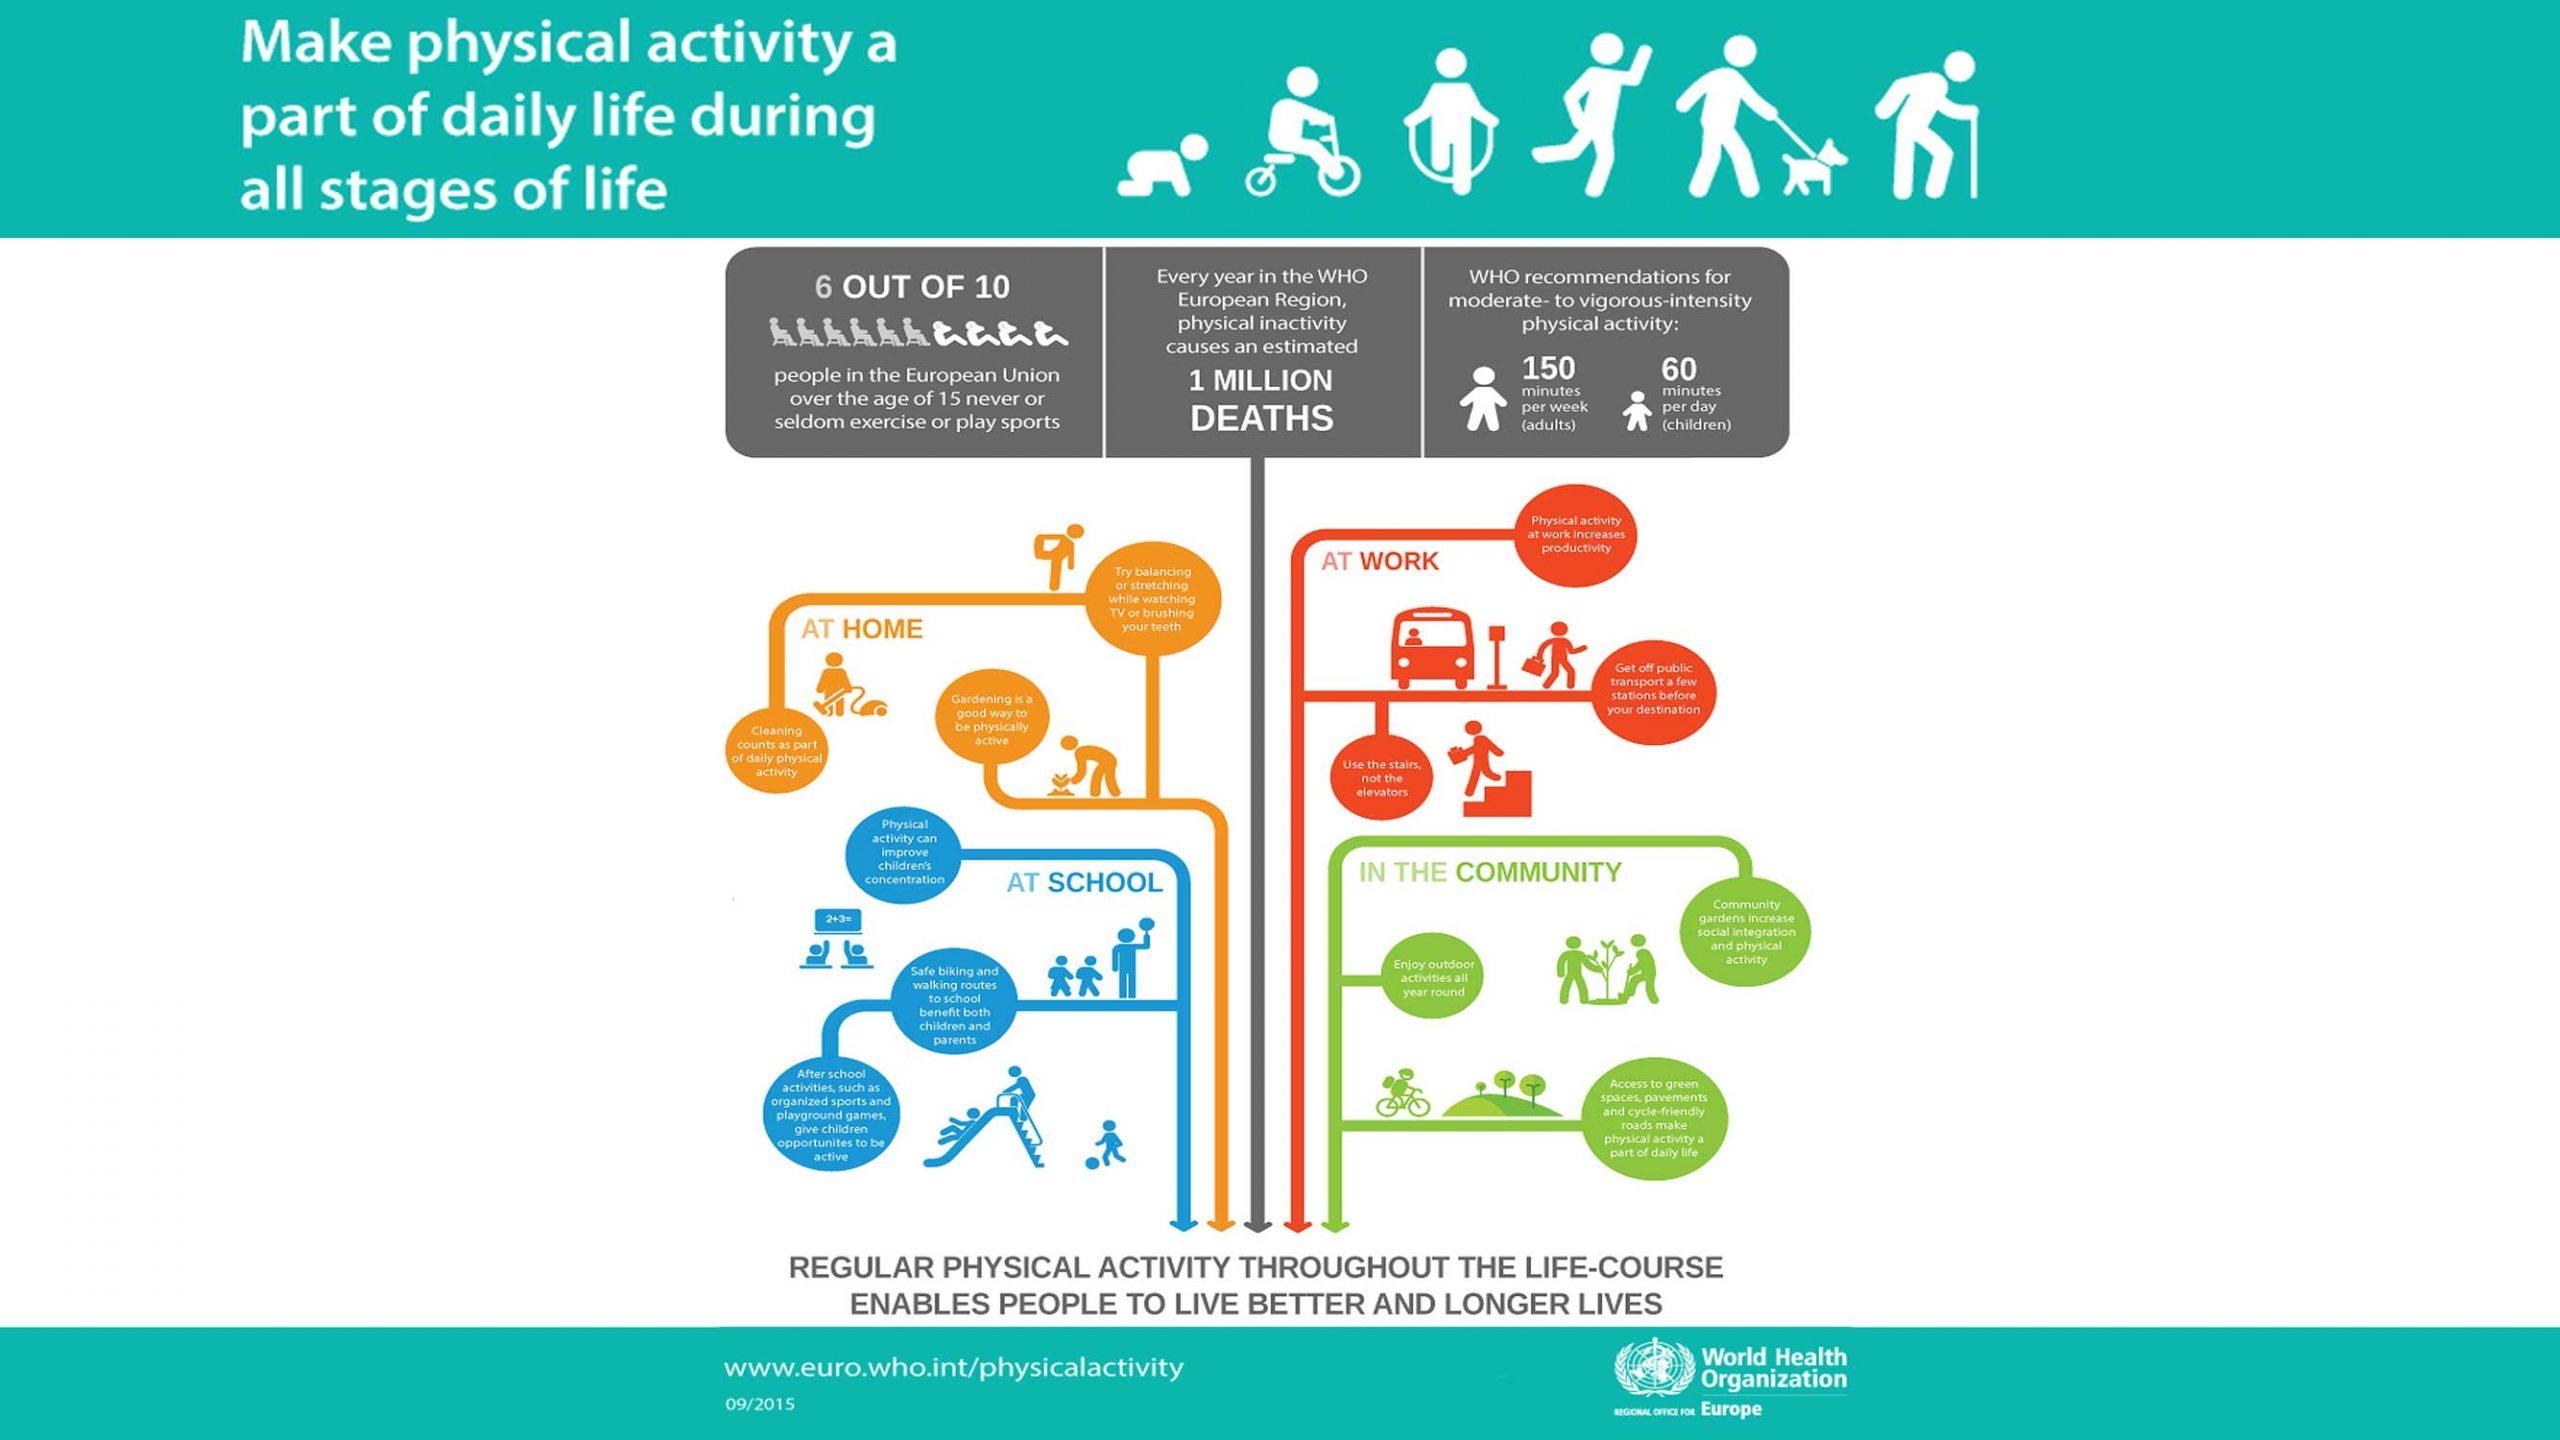 PhysicalActivityAllStagesOfLife